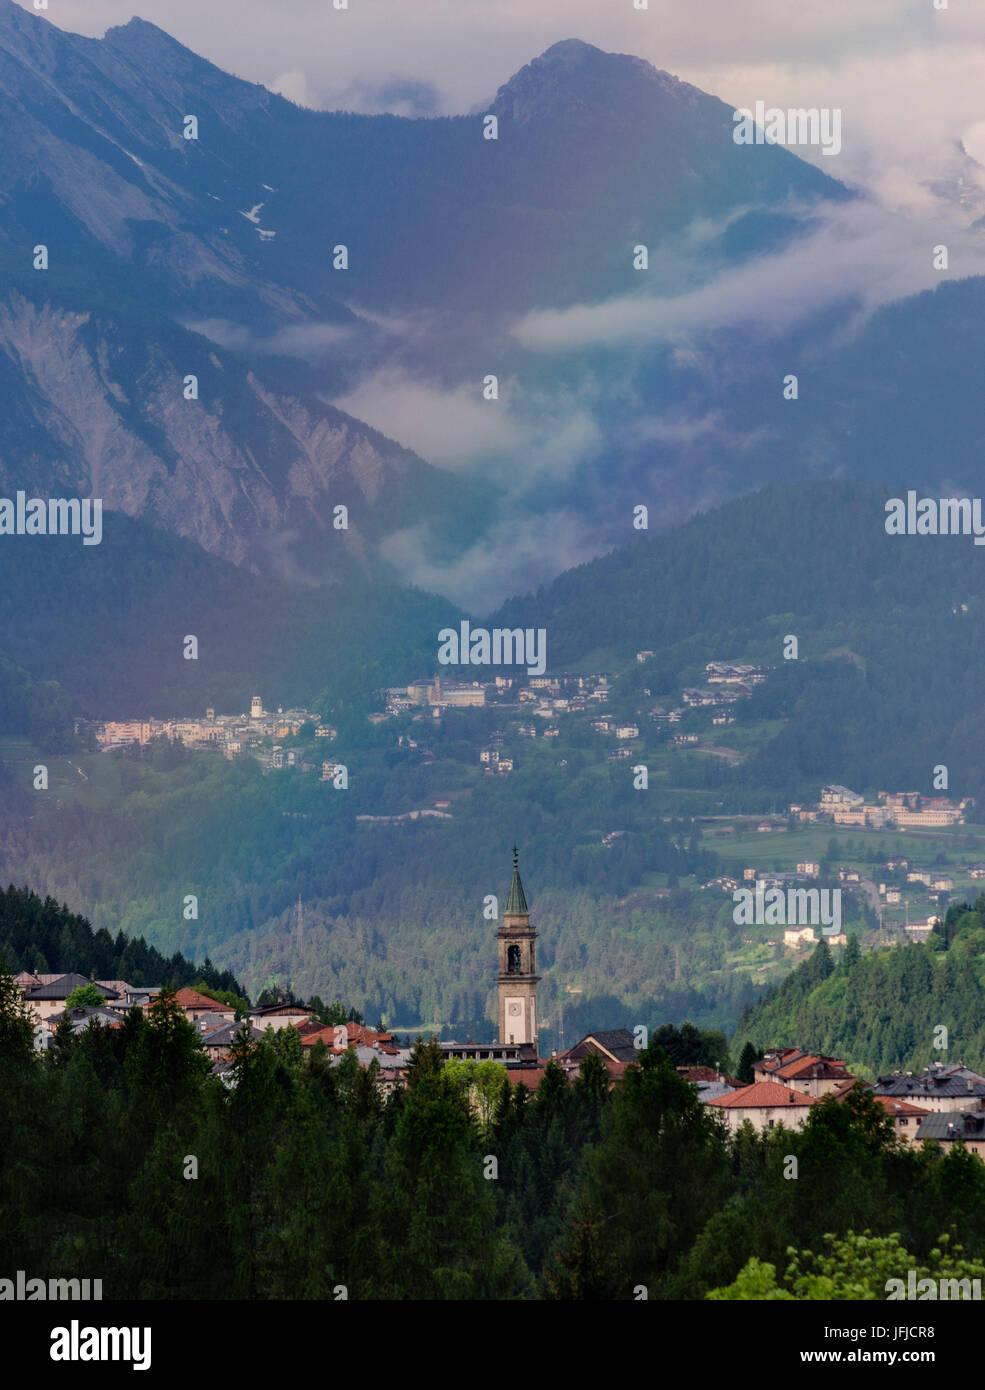 Lorenzago di Cadore, Dolomiti, Veneto, Italy, Lorenzago di Cadore and a rainbow - Stock Image